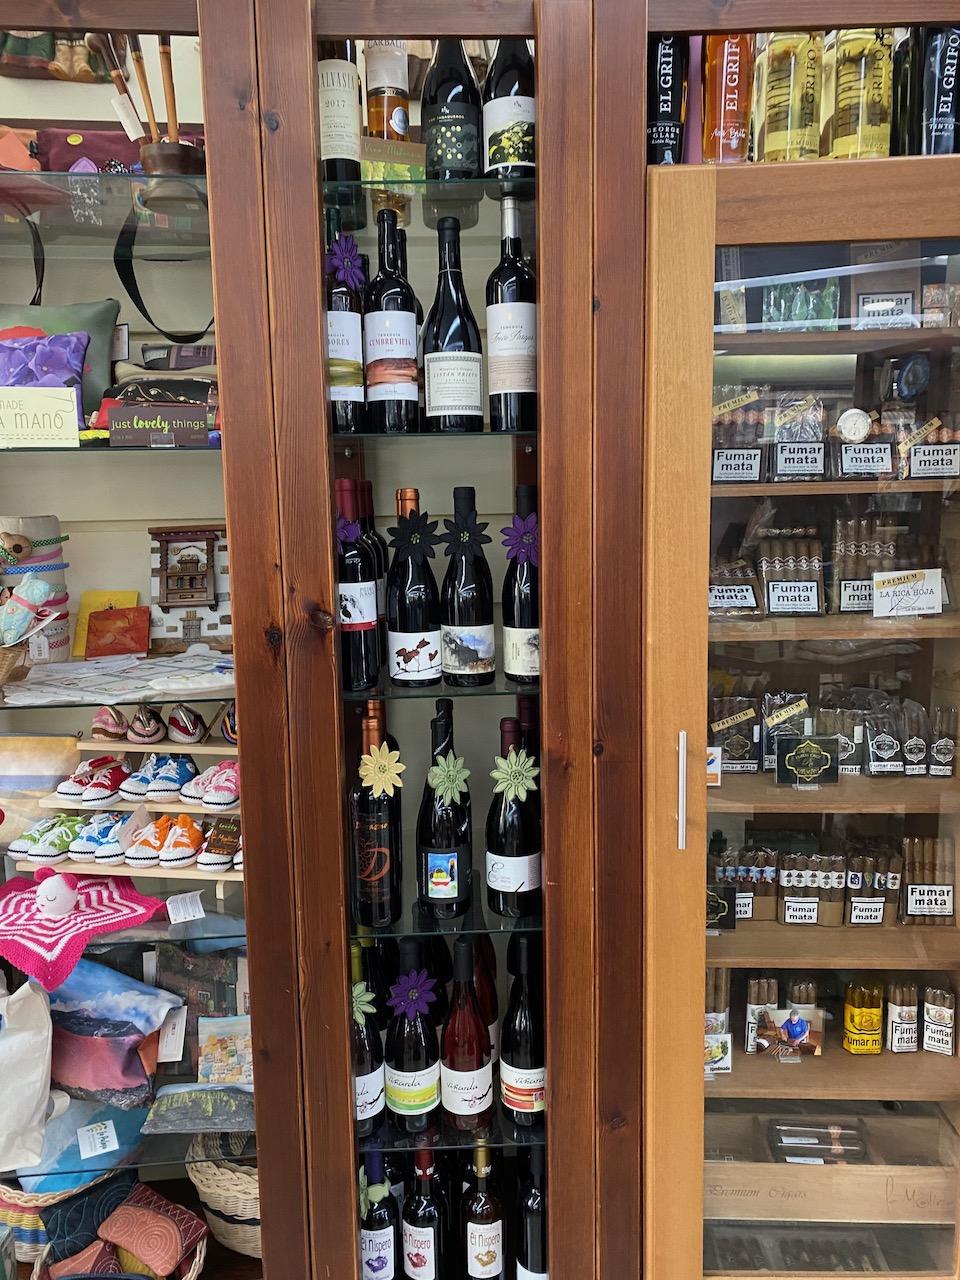 Wines from La Palma